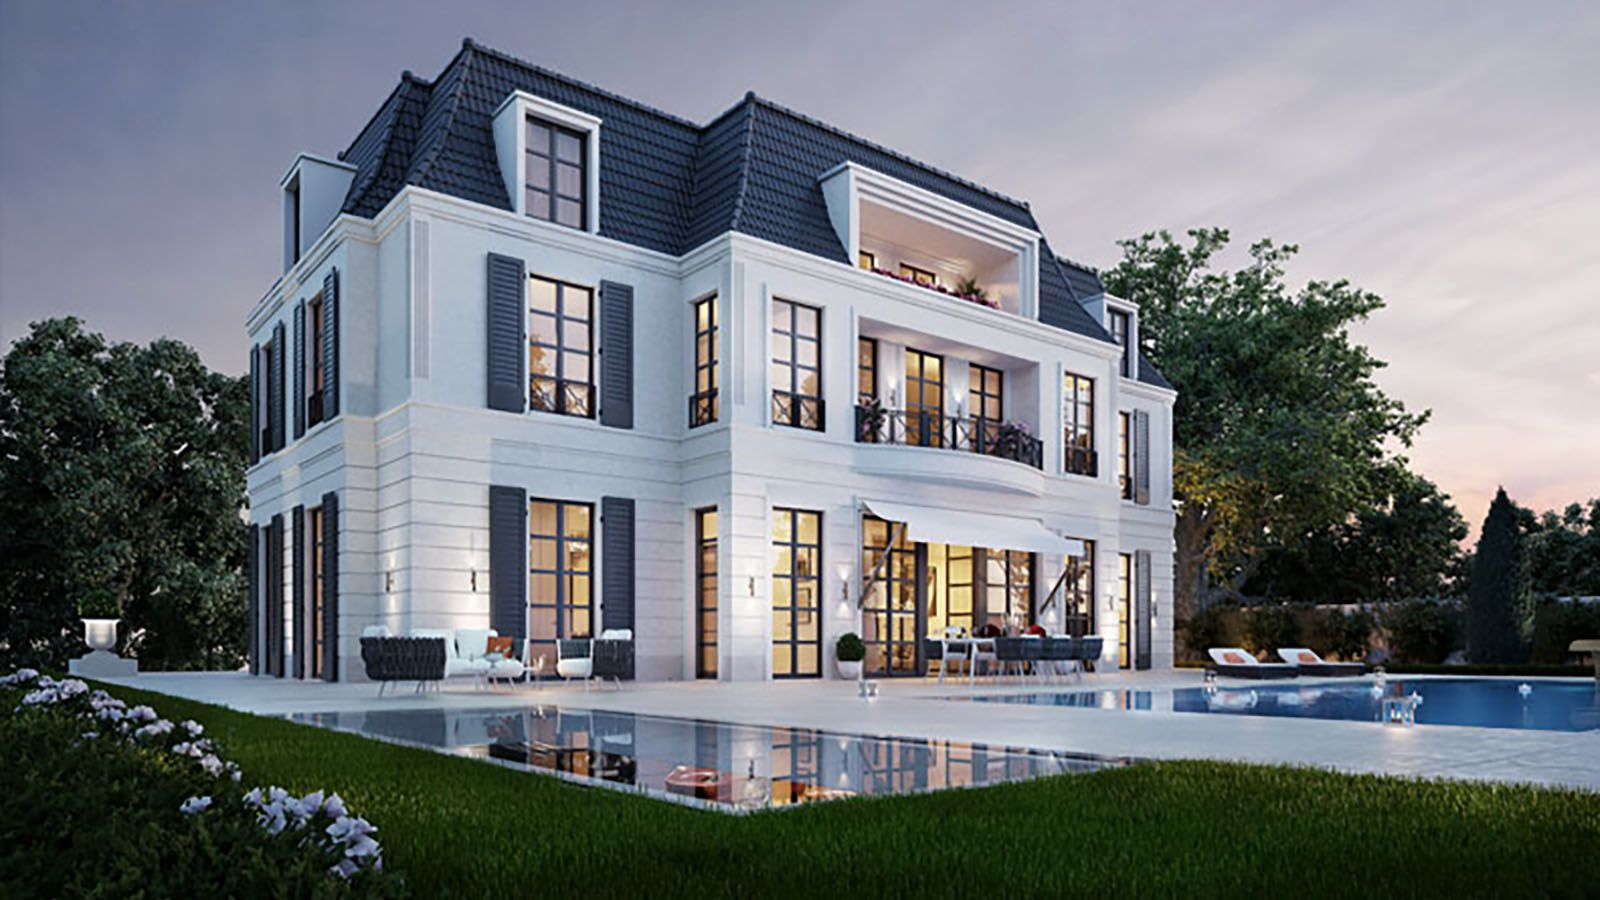 Einfamilien Villa | München Altbogenhausen | M-CONCEPT Real Estate ...